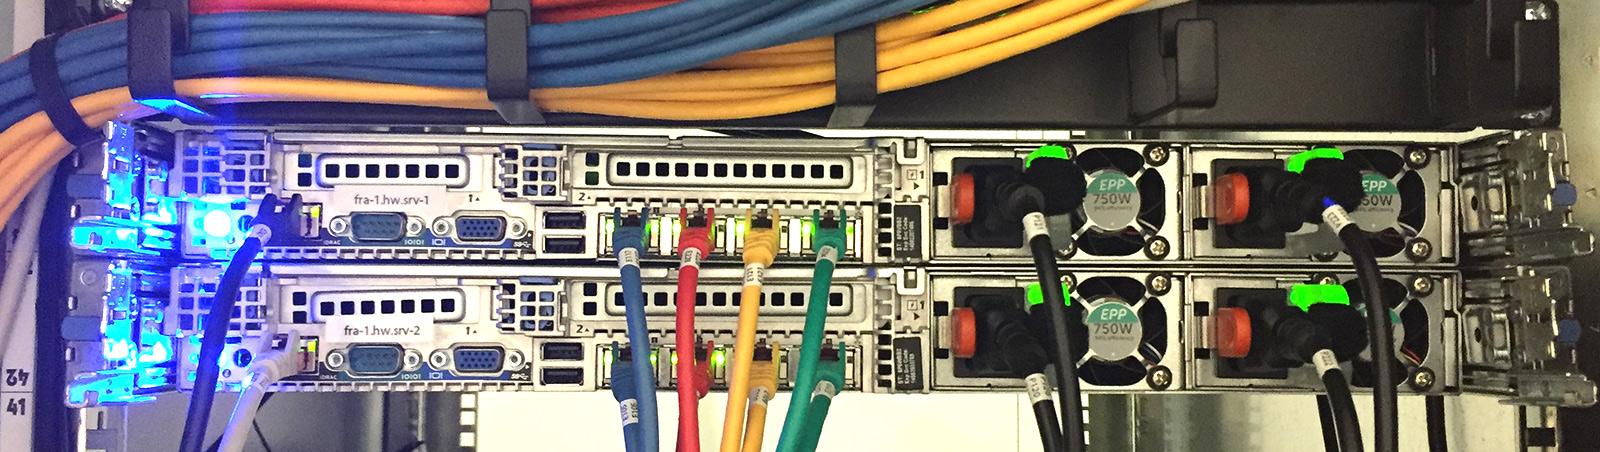 IT Infrastruktur Verkabelung